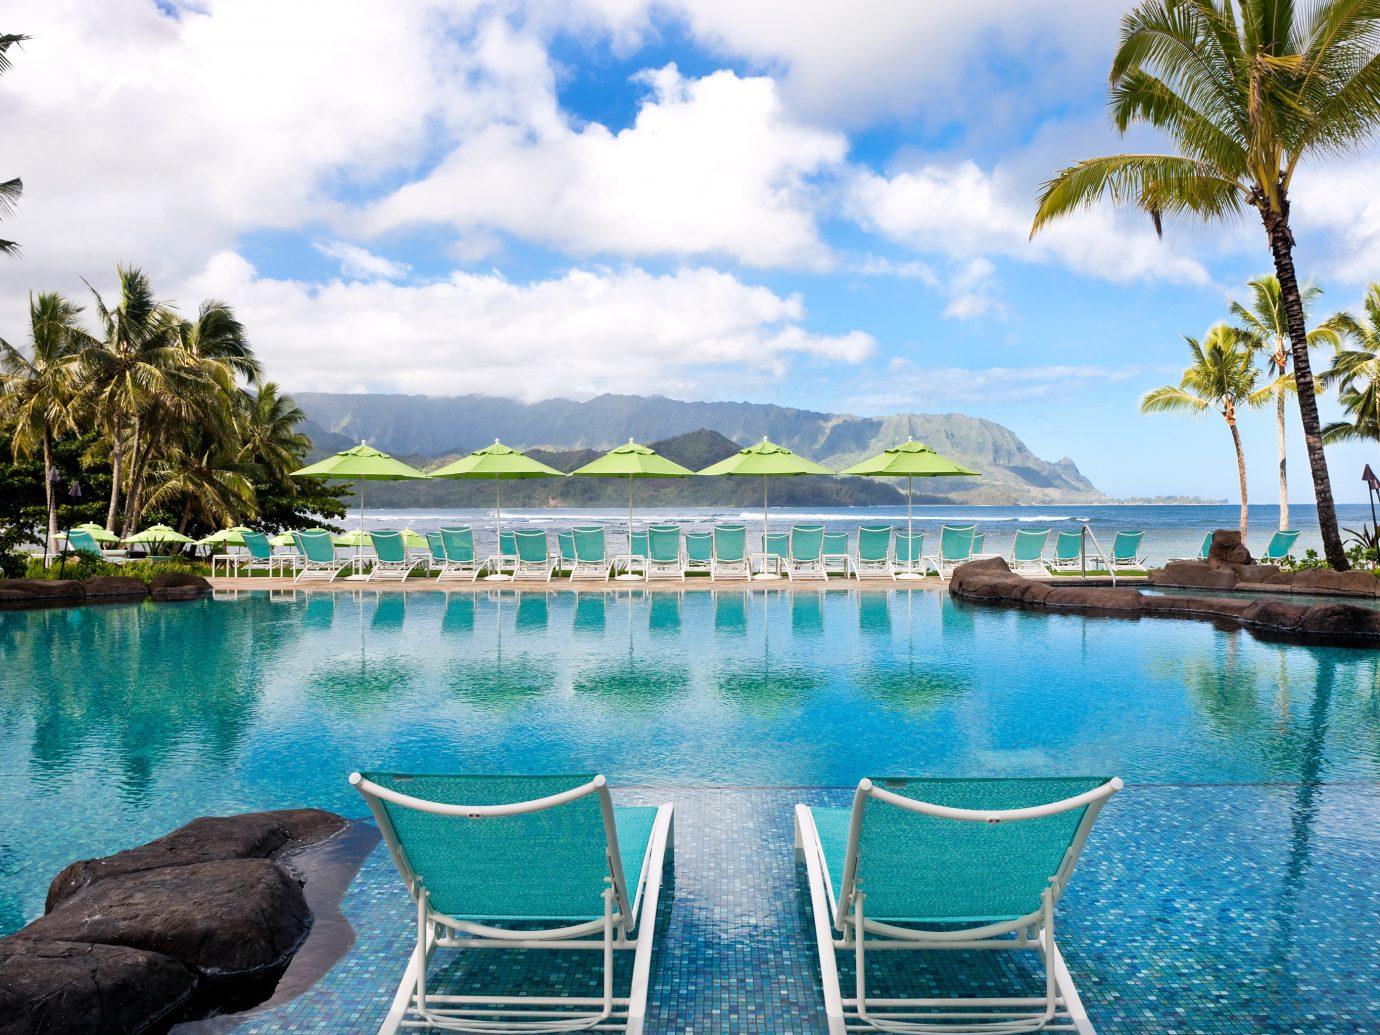 Infinity Pool At St. Regis Princeville Resort In Kauai, Hawaii